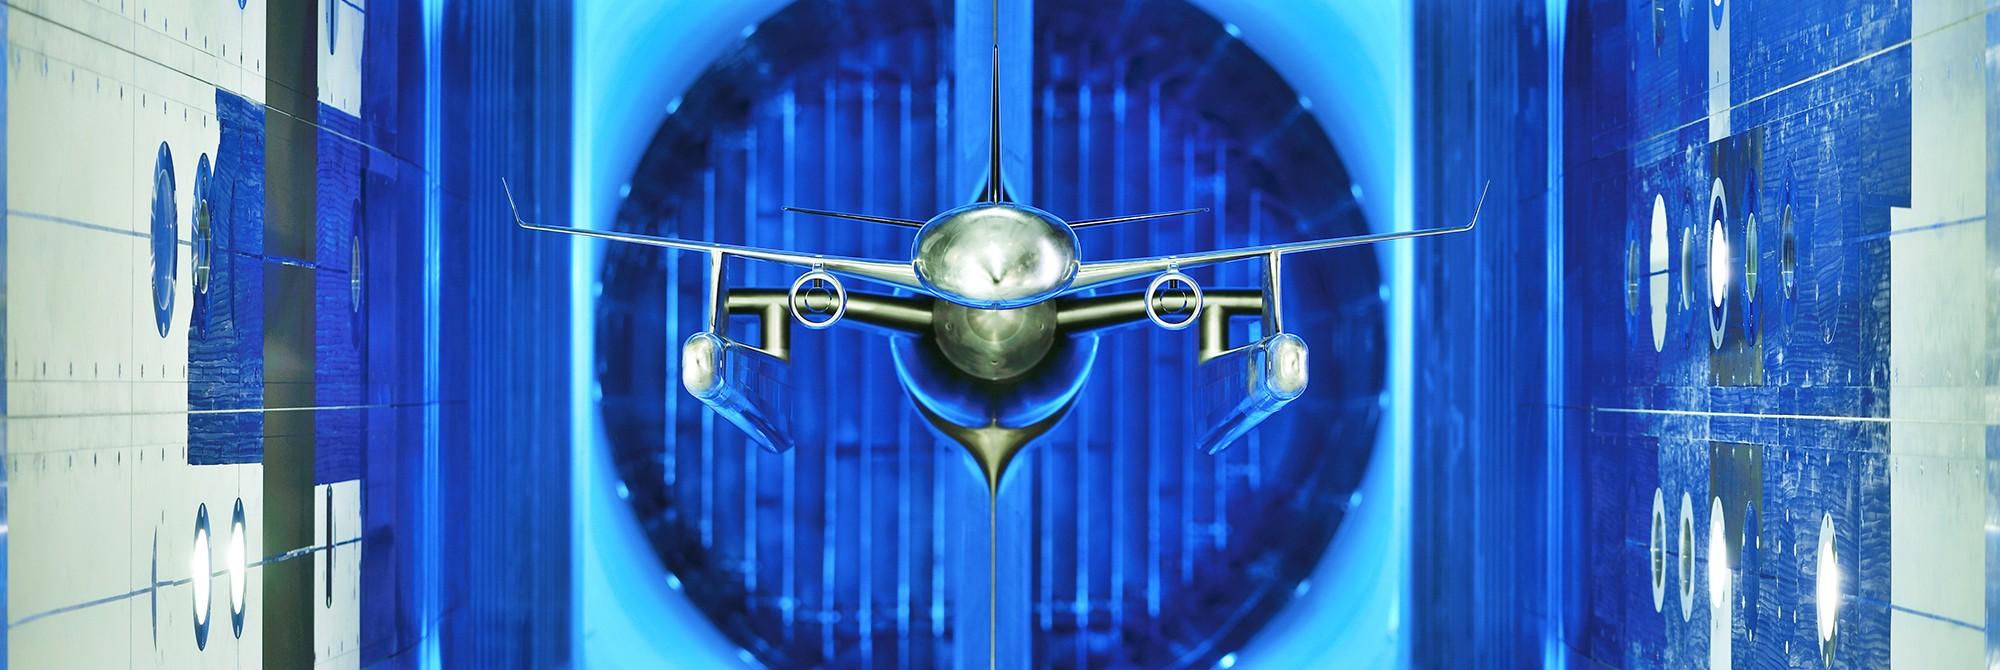 Aerosapce Industry